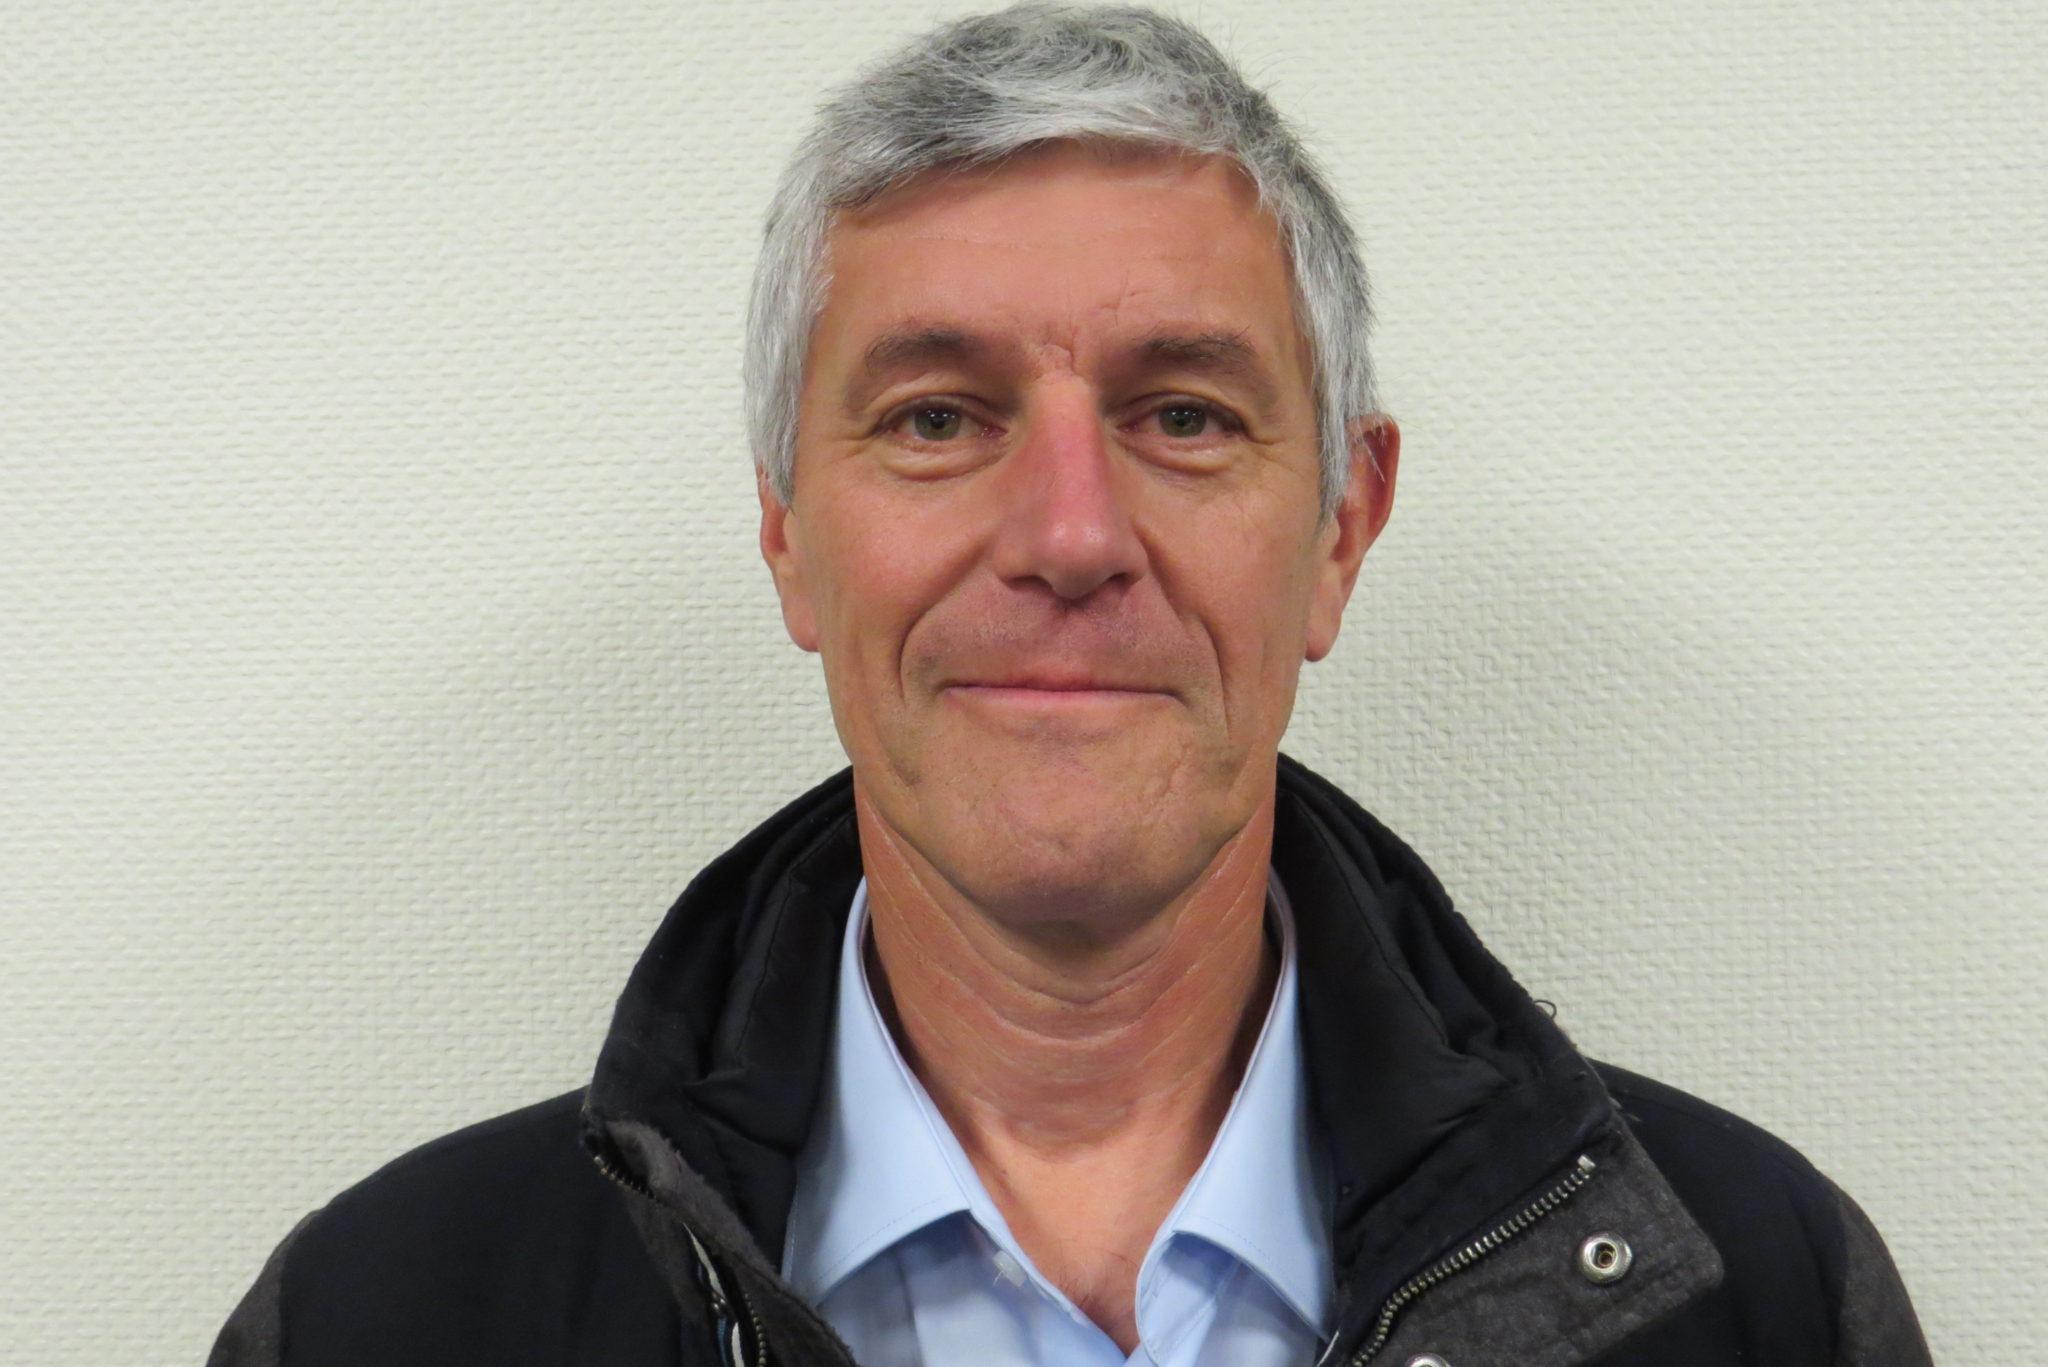 Thierry UJMA